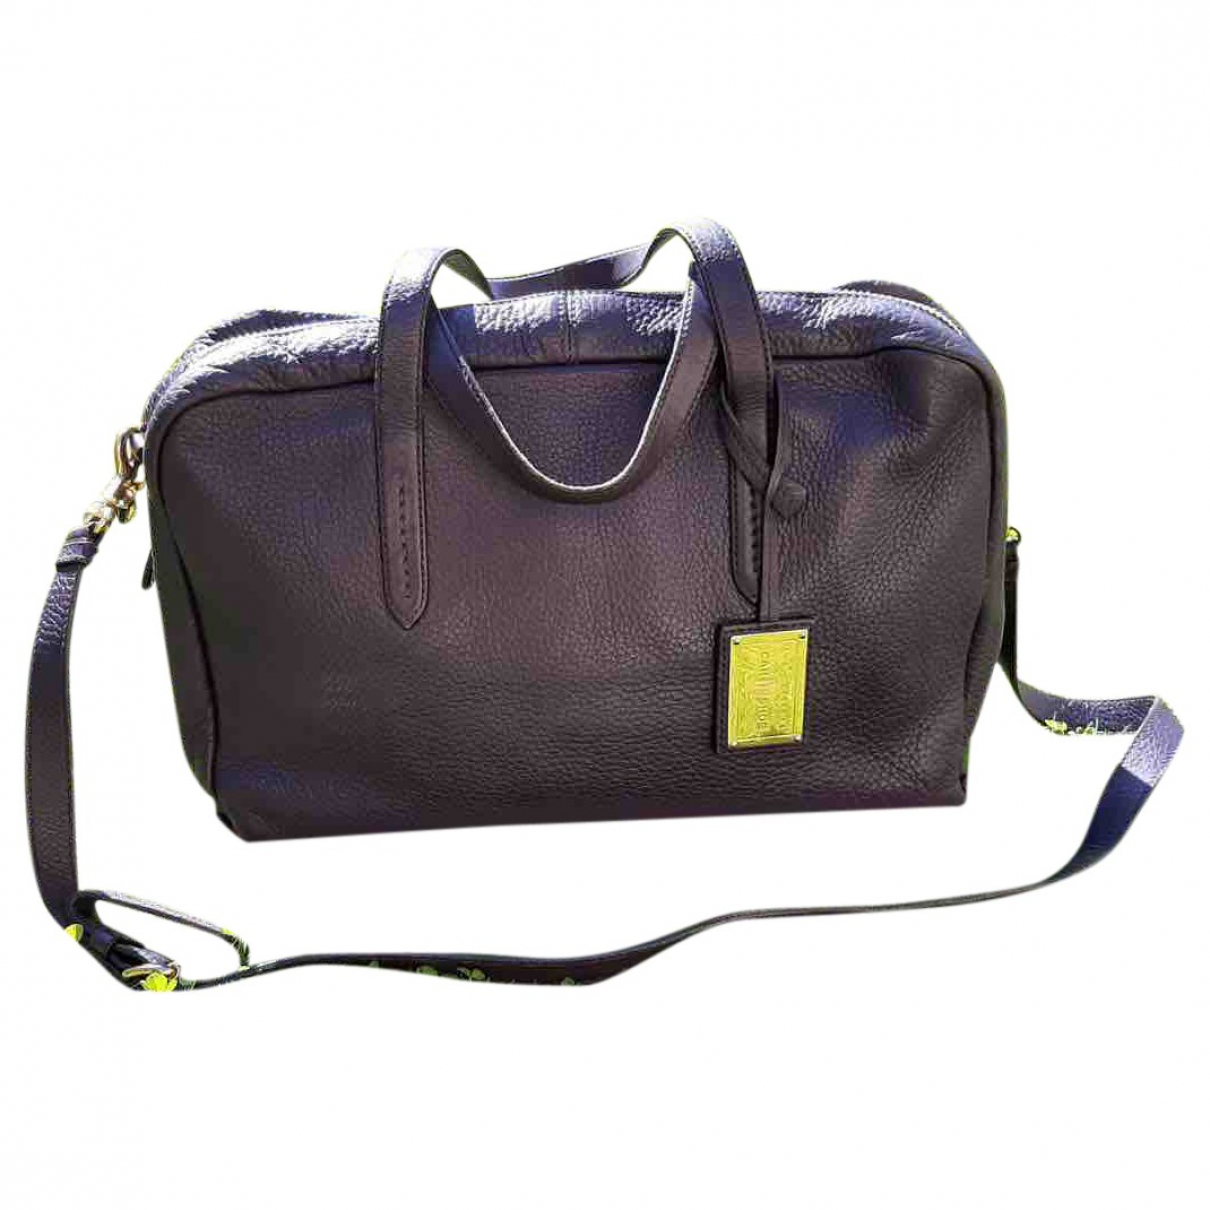 Carshoe N Purple Leather handbag for Women N